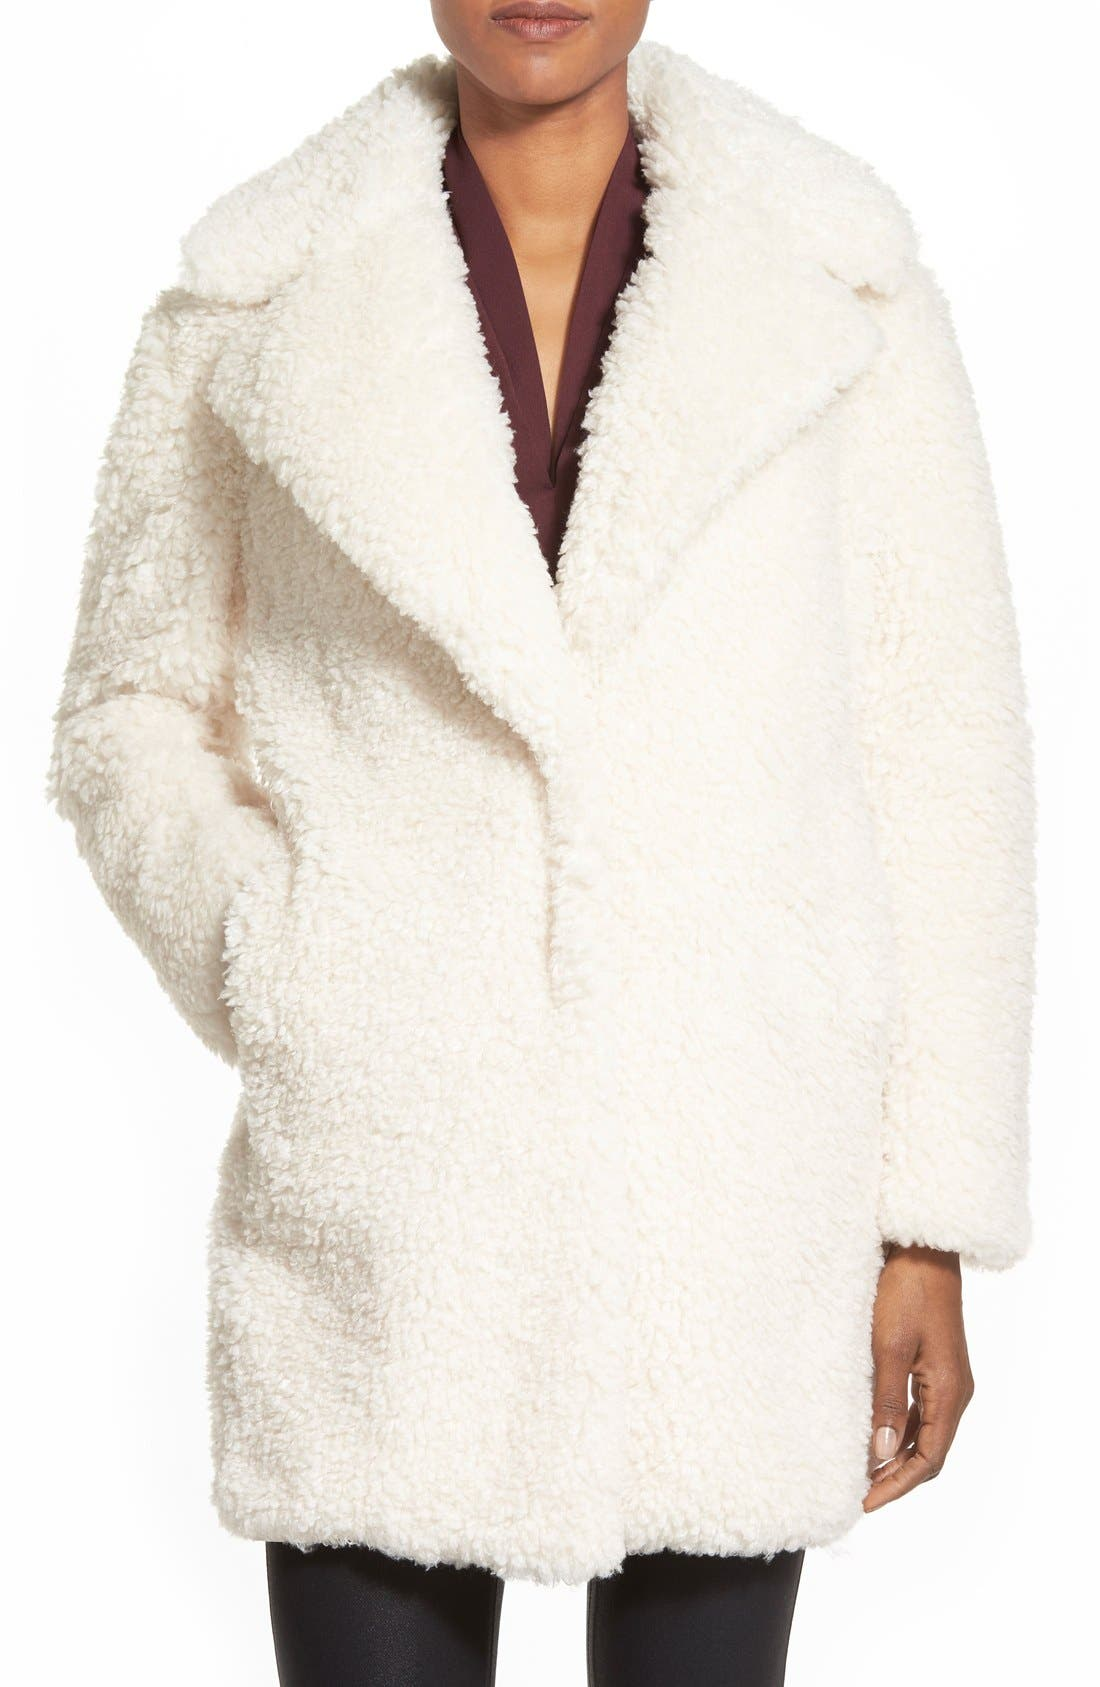 Alternate Image 1 Selected - kensie 'Teddy Bear' Notch Collar Reversible Faux Fur Coat (Online Only)